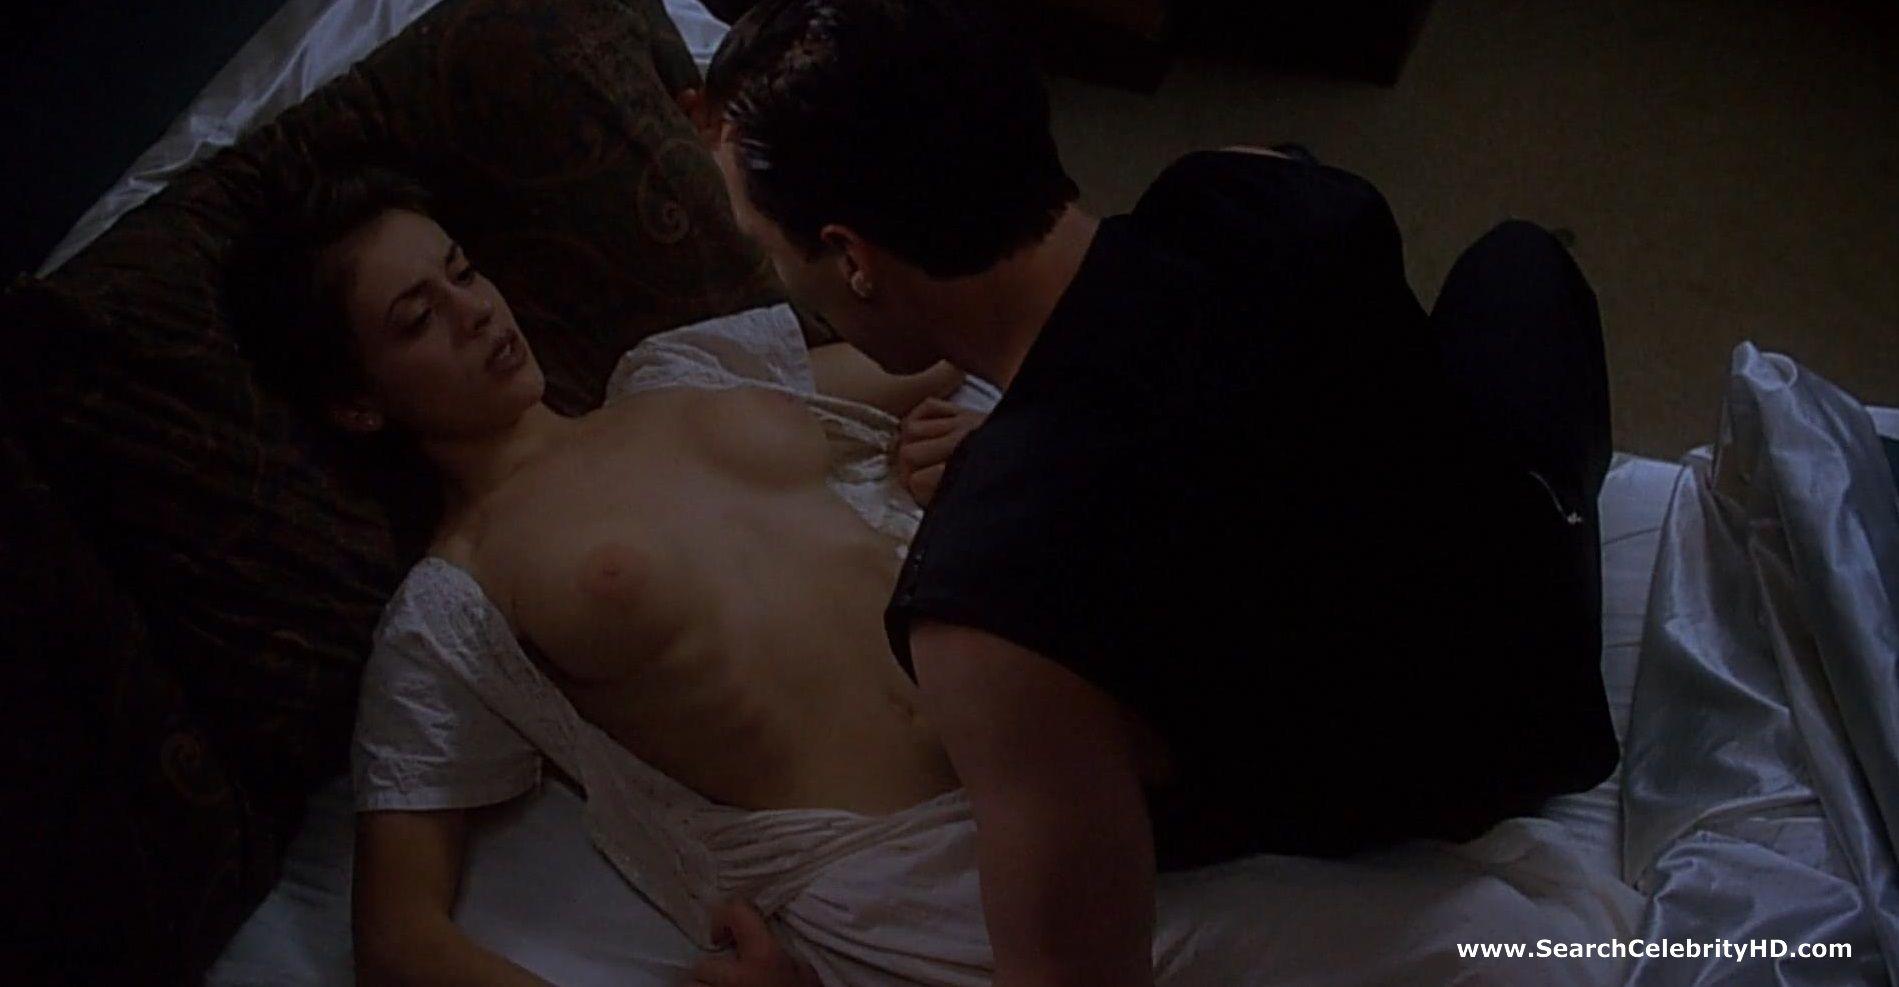 Vampire pron pic nudes tube